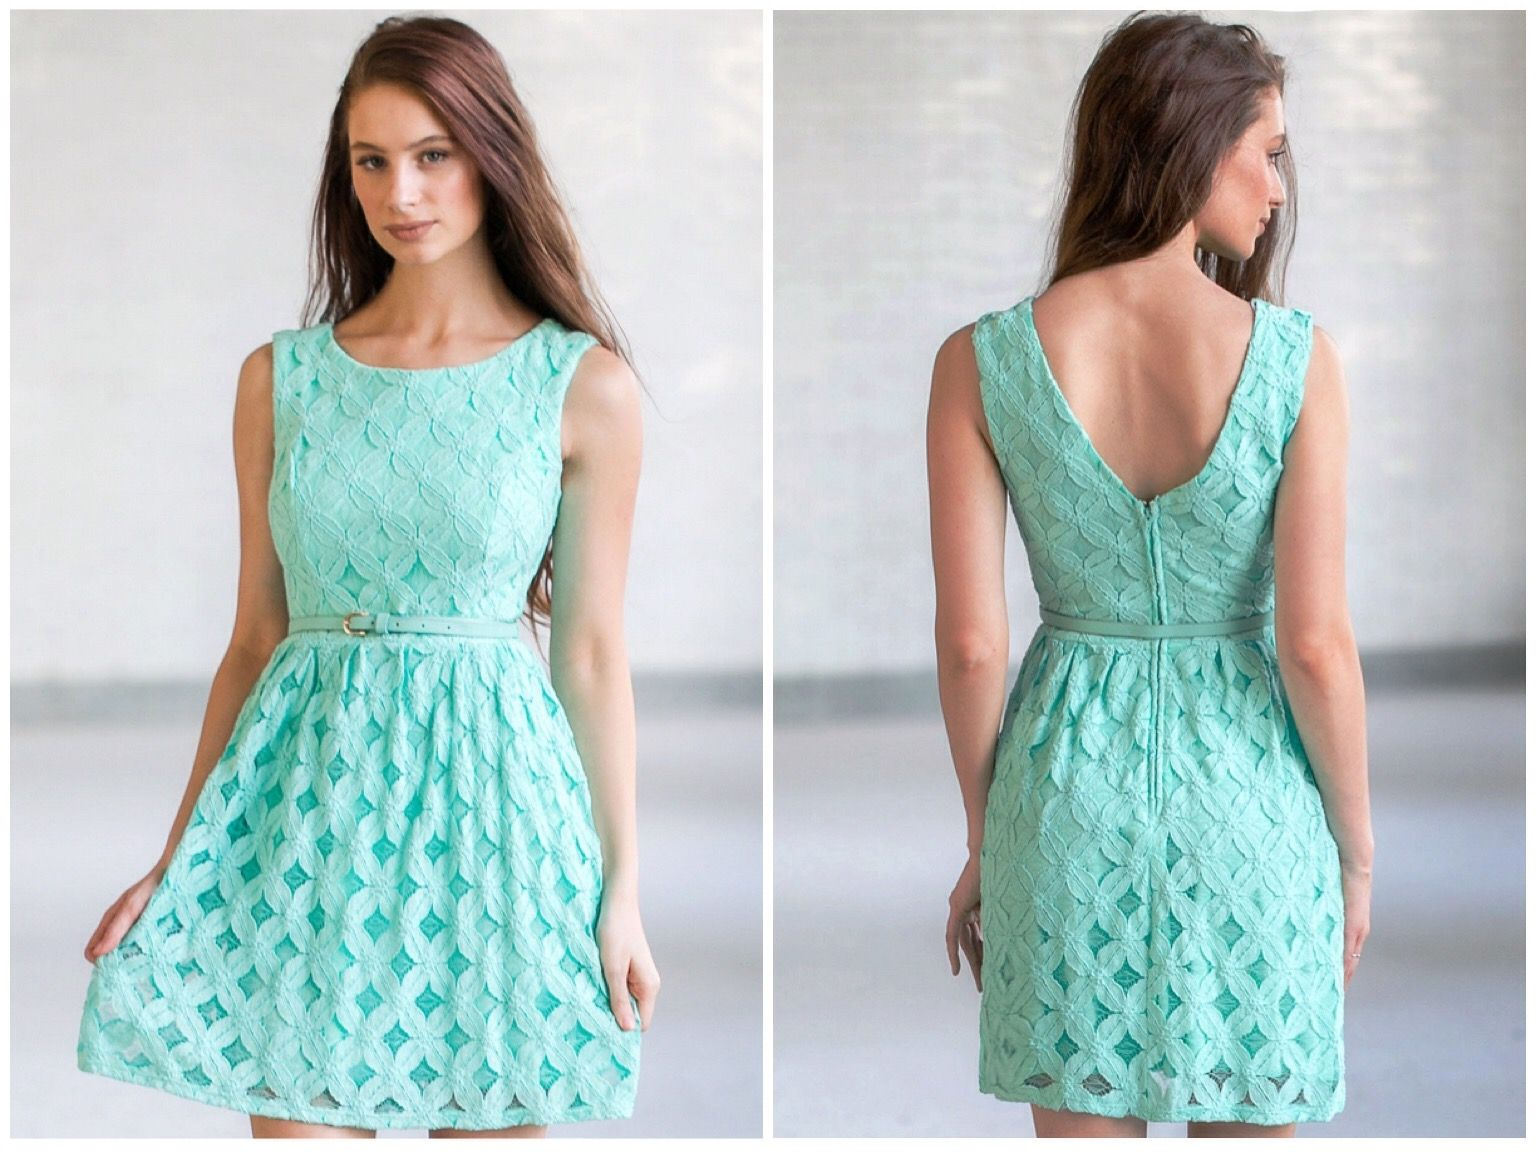 This aqua lace dress has a cute A-line cut! http://ss1.us/a/uHgQb5PM ...